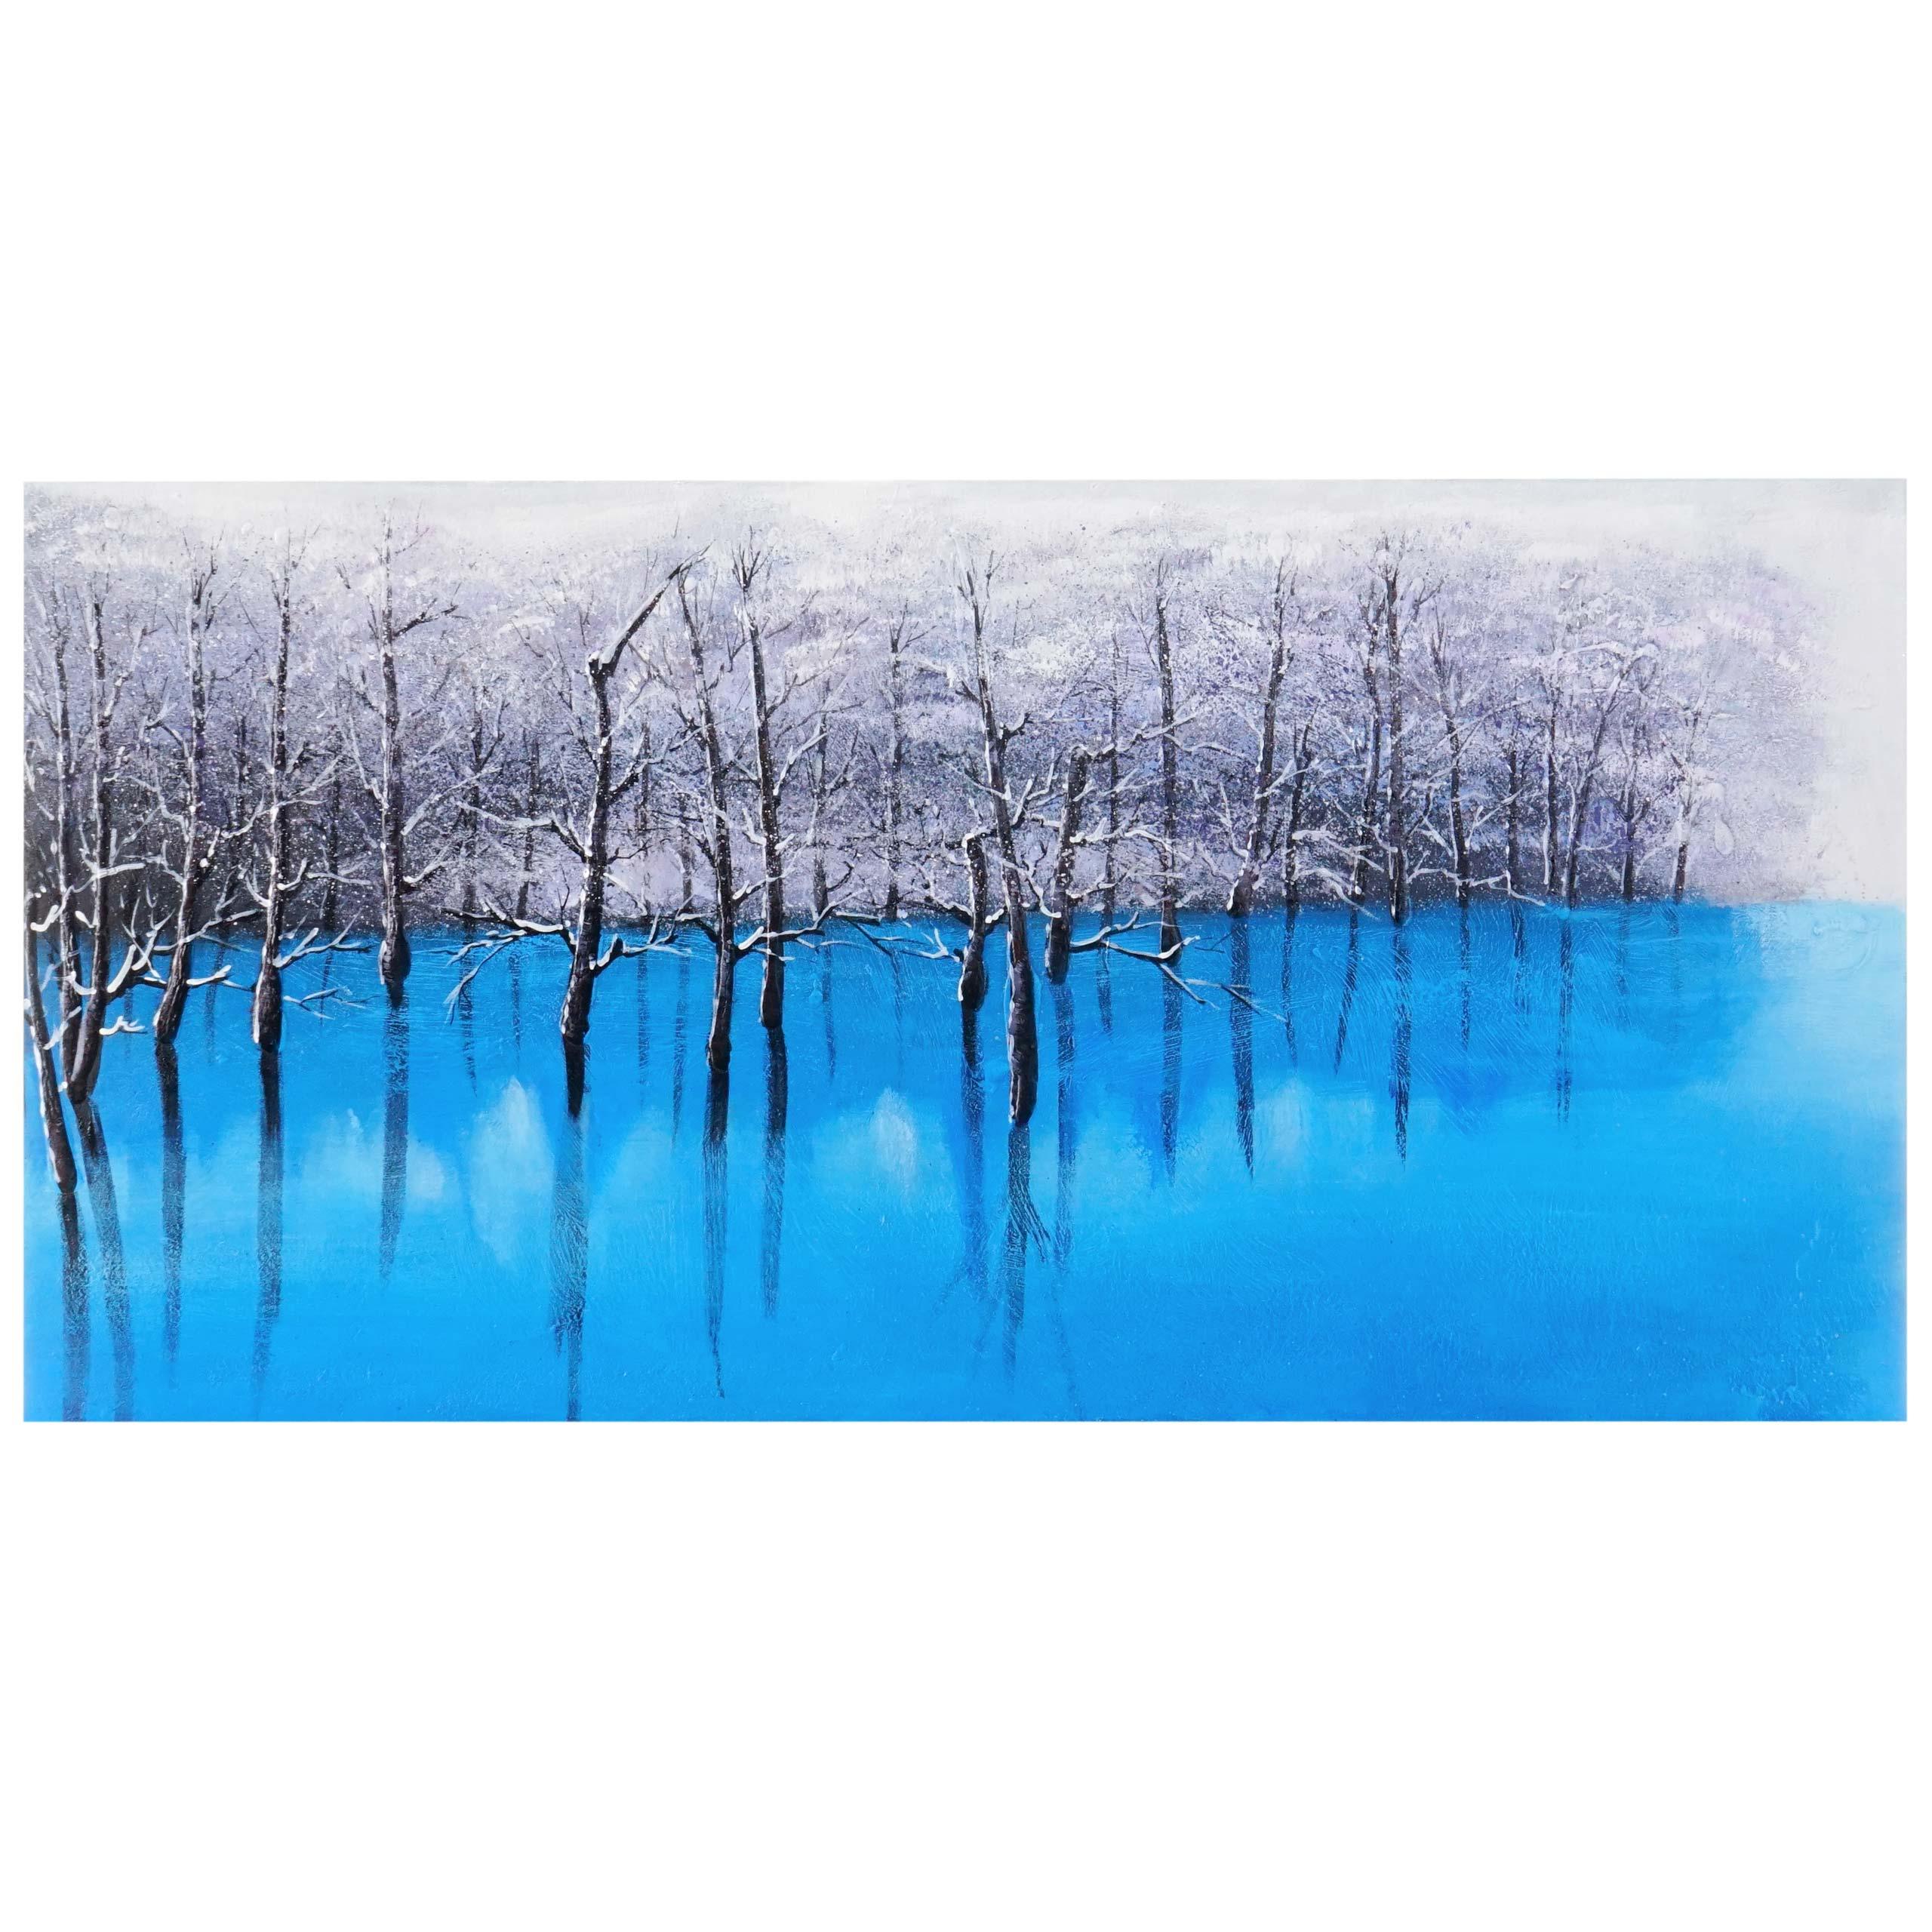 Mendler Ölgemälde Blauer See, 100% handgemaltes Wandbild Gemälde XL, 140x70cm ~ Variantenangebot 44736